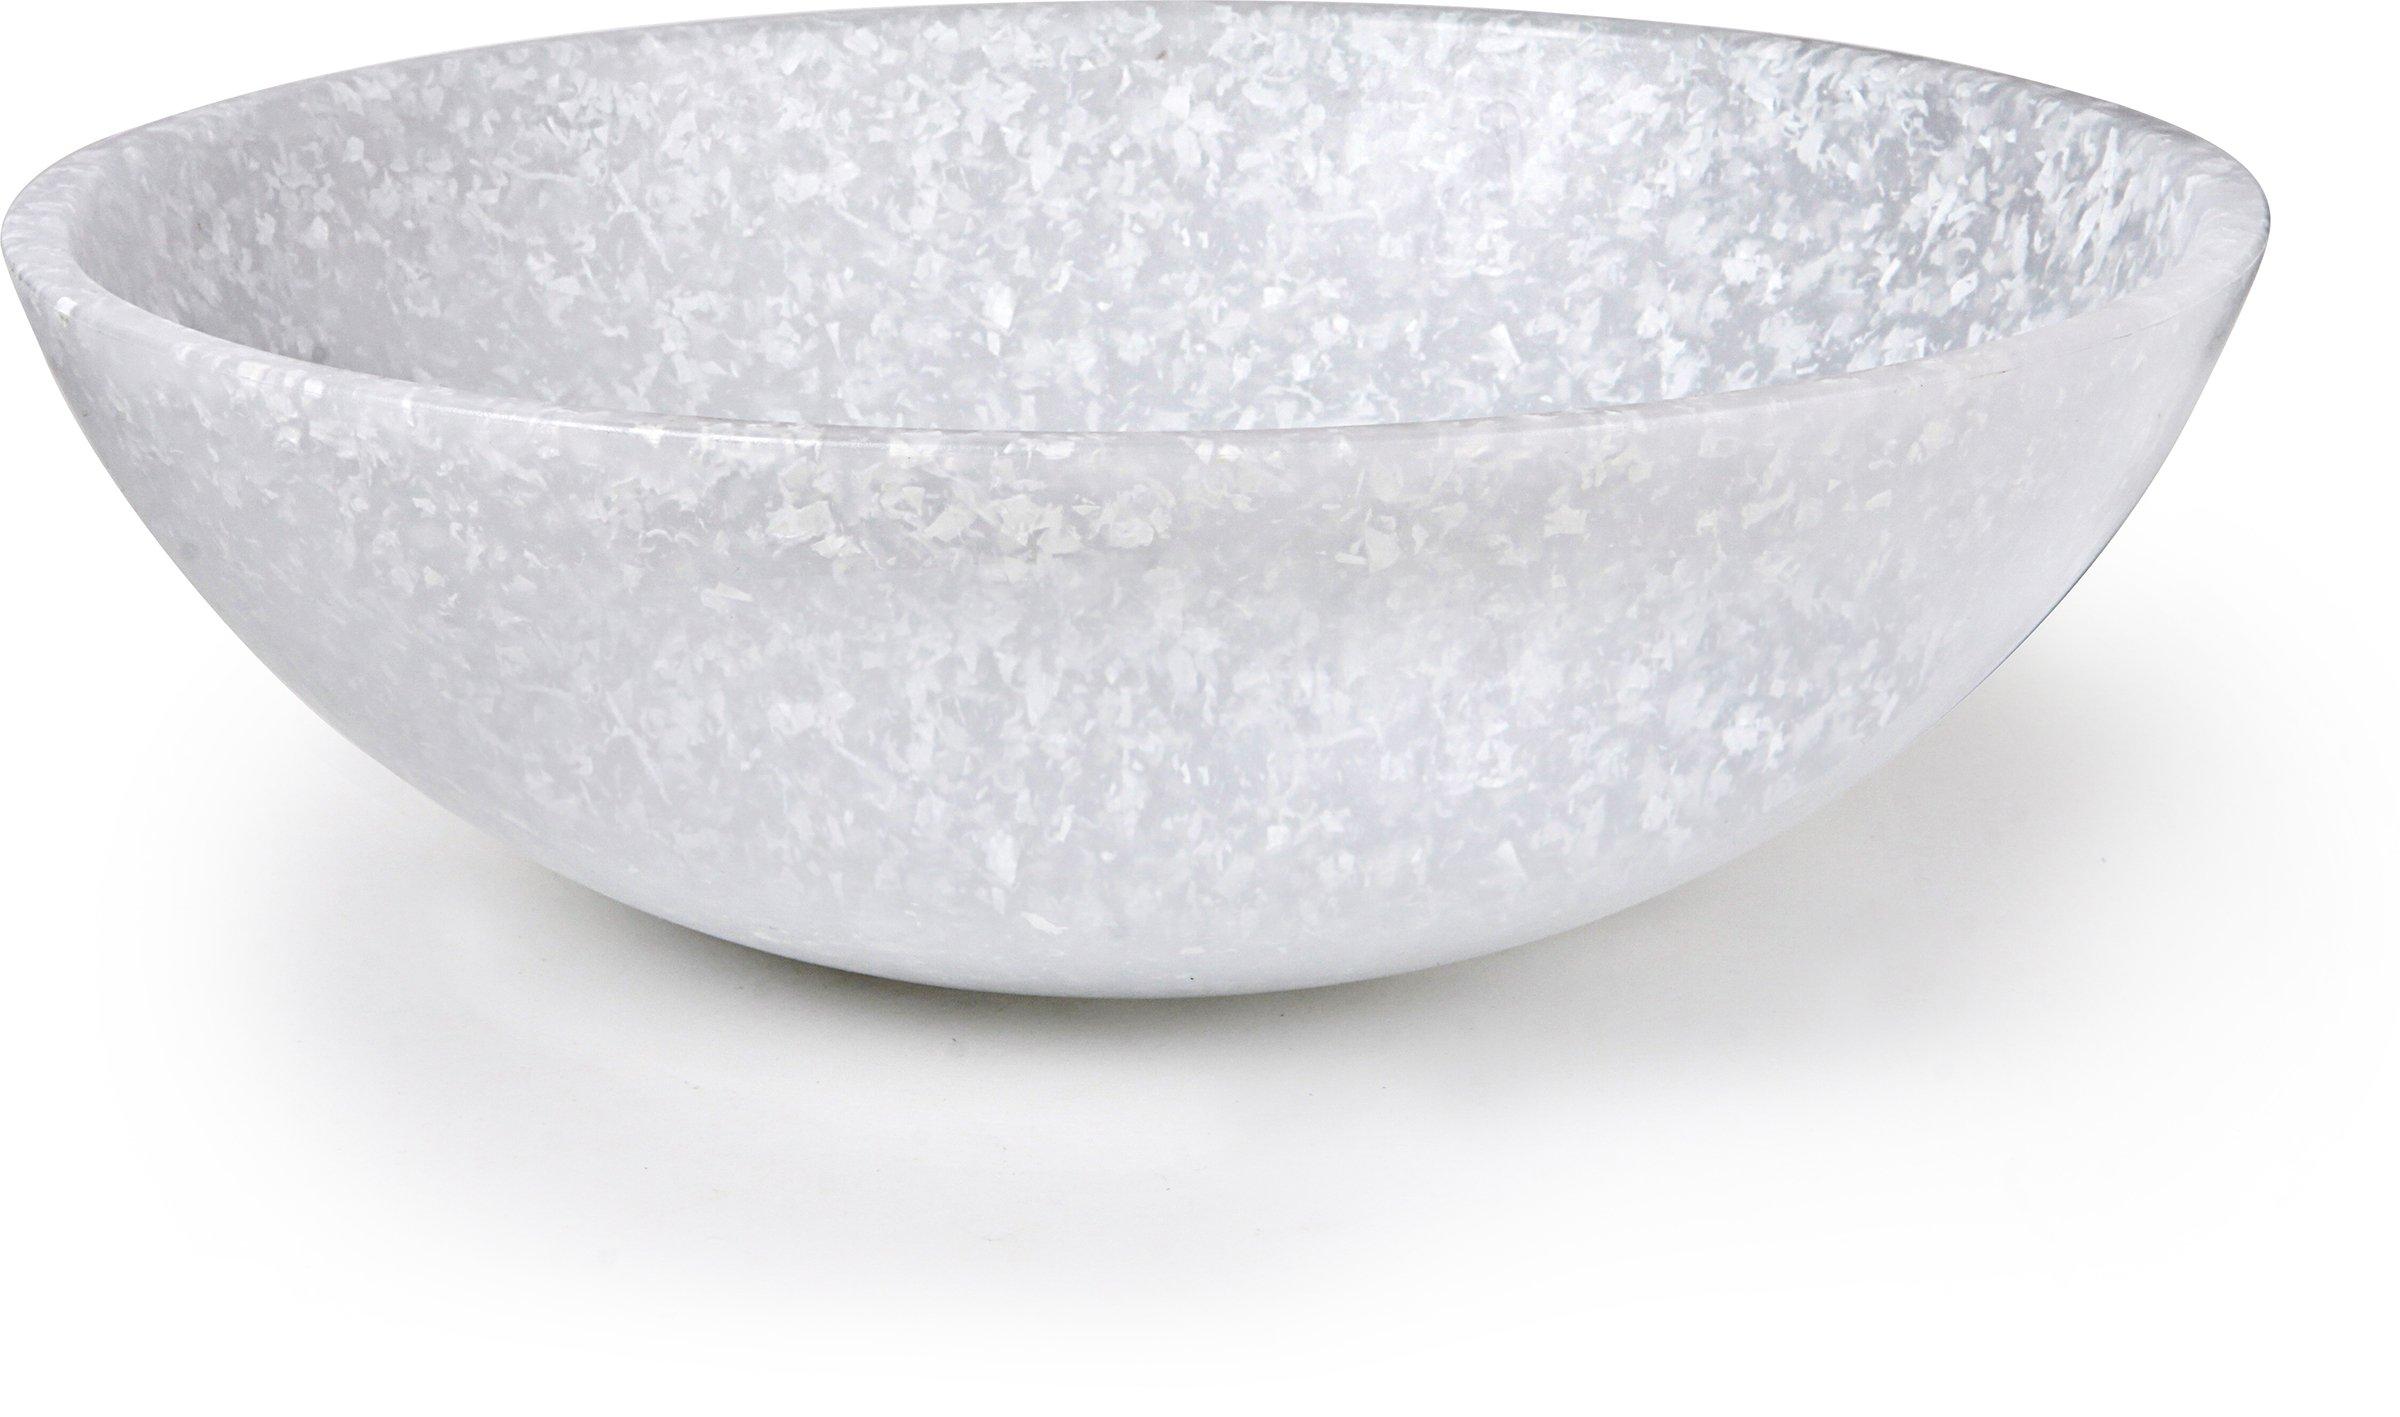 Dexas Jelli Plastic Salad Bowl, 13 Inch Diameter, Granite Pattern